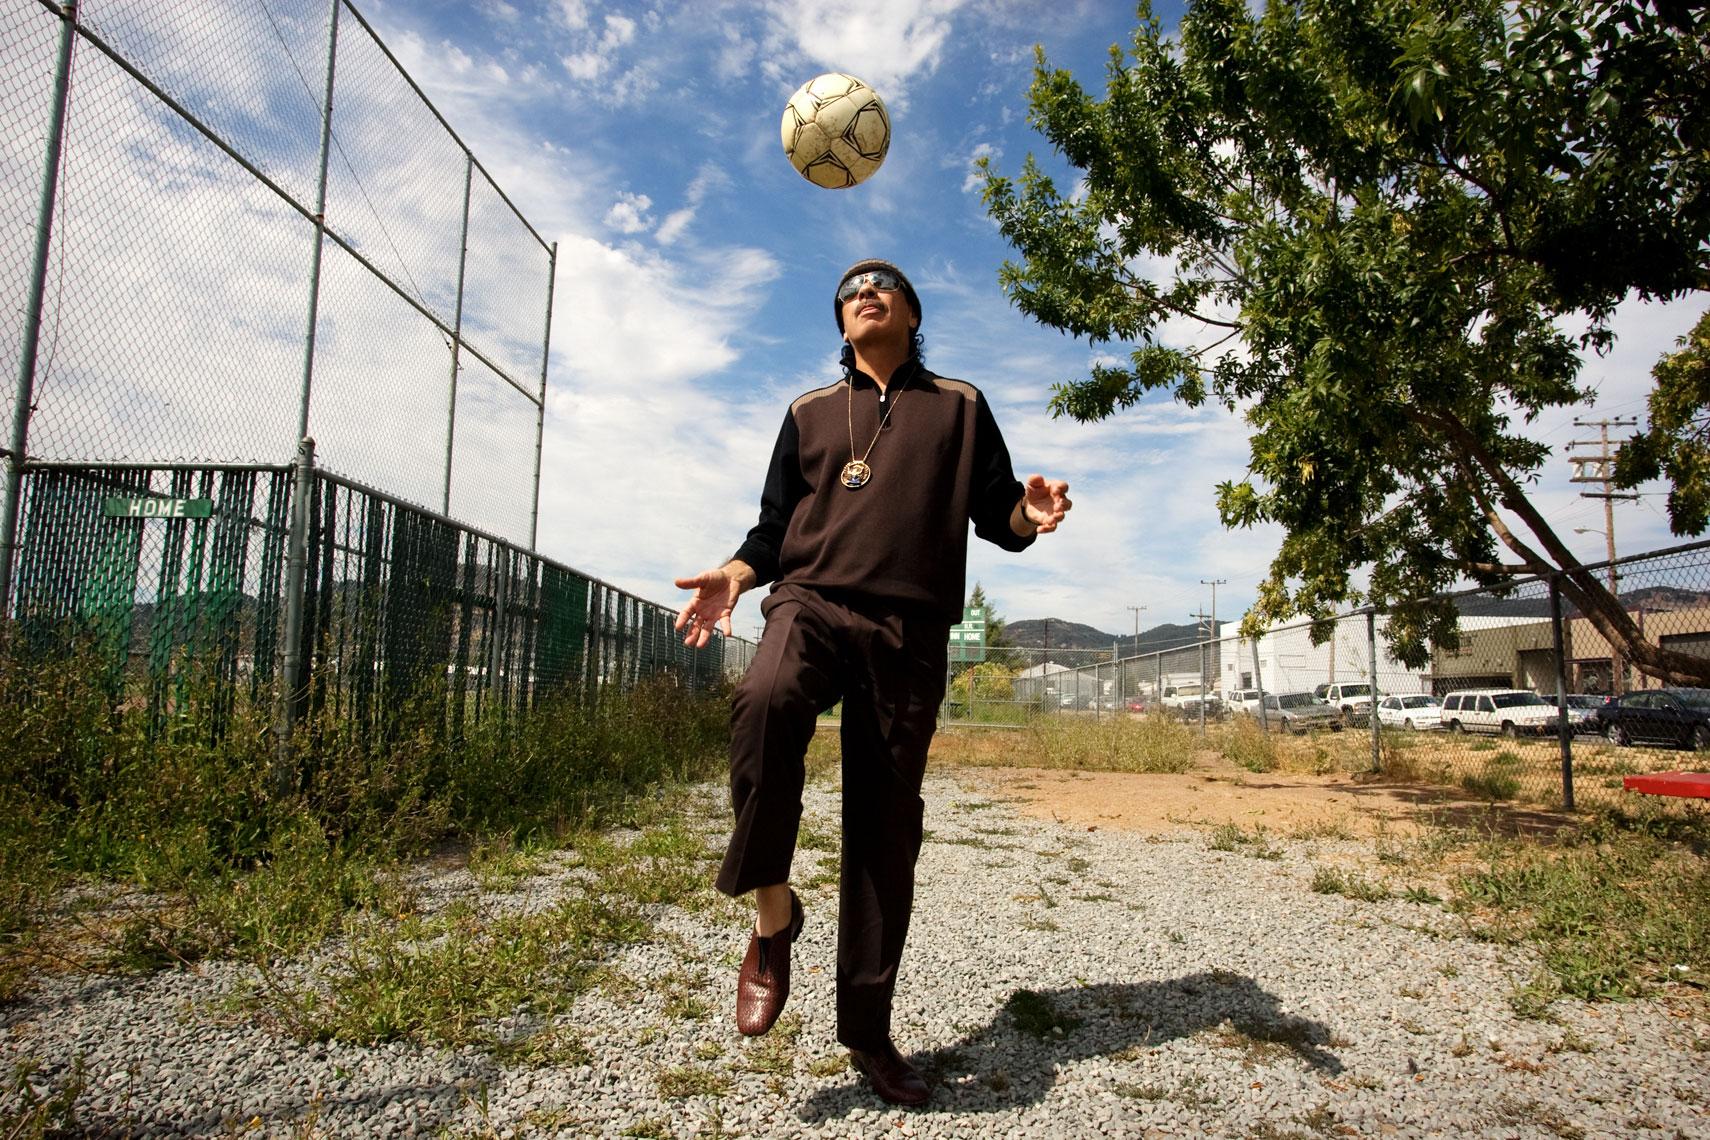 CarlosSantanaLZ1T8285.jpg